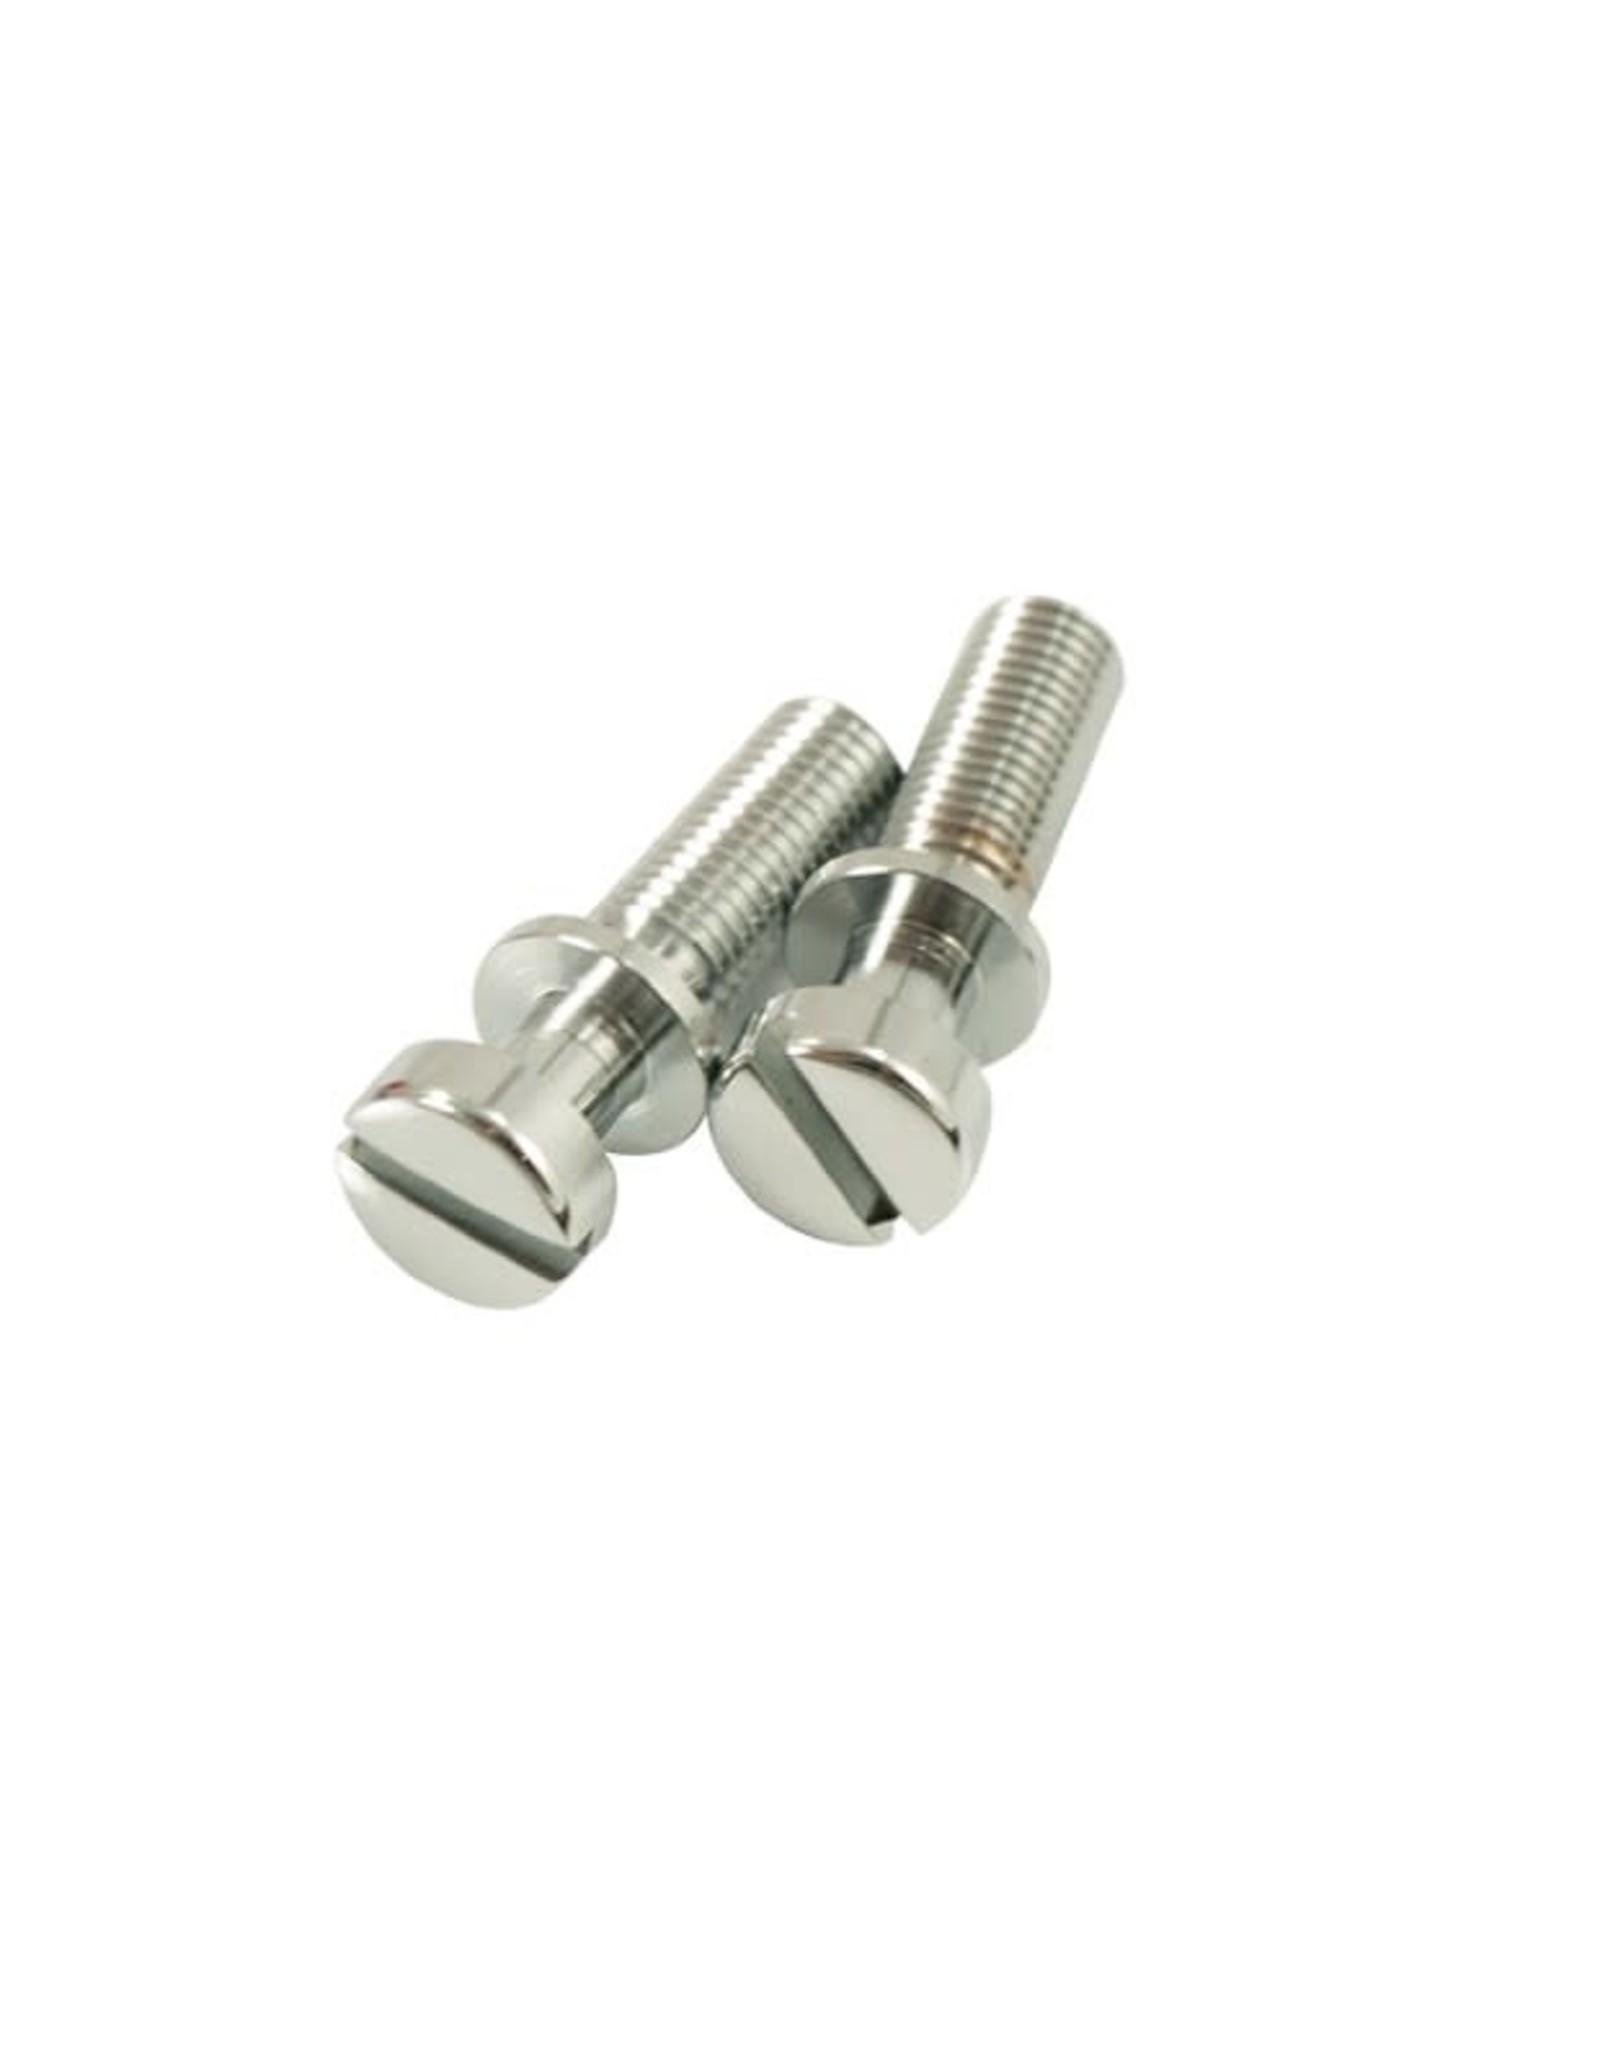 Kluson Kluson USA Steel Stop Tailpiece Stud Set USA Thread Chrome